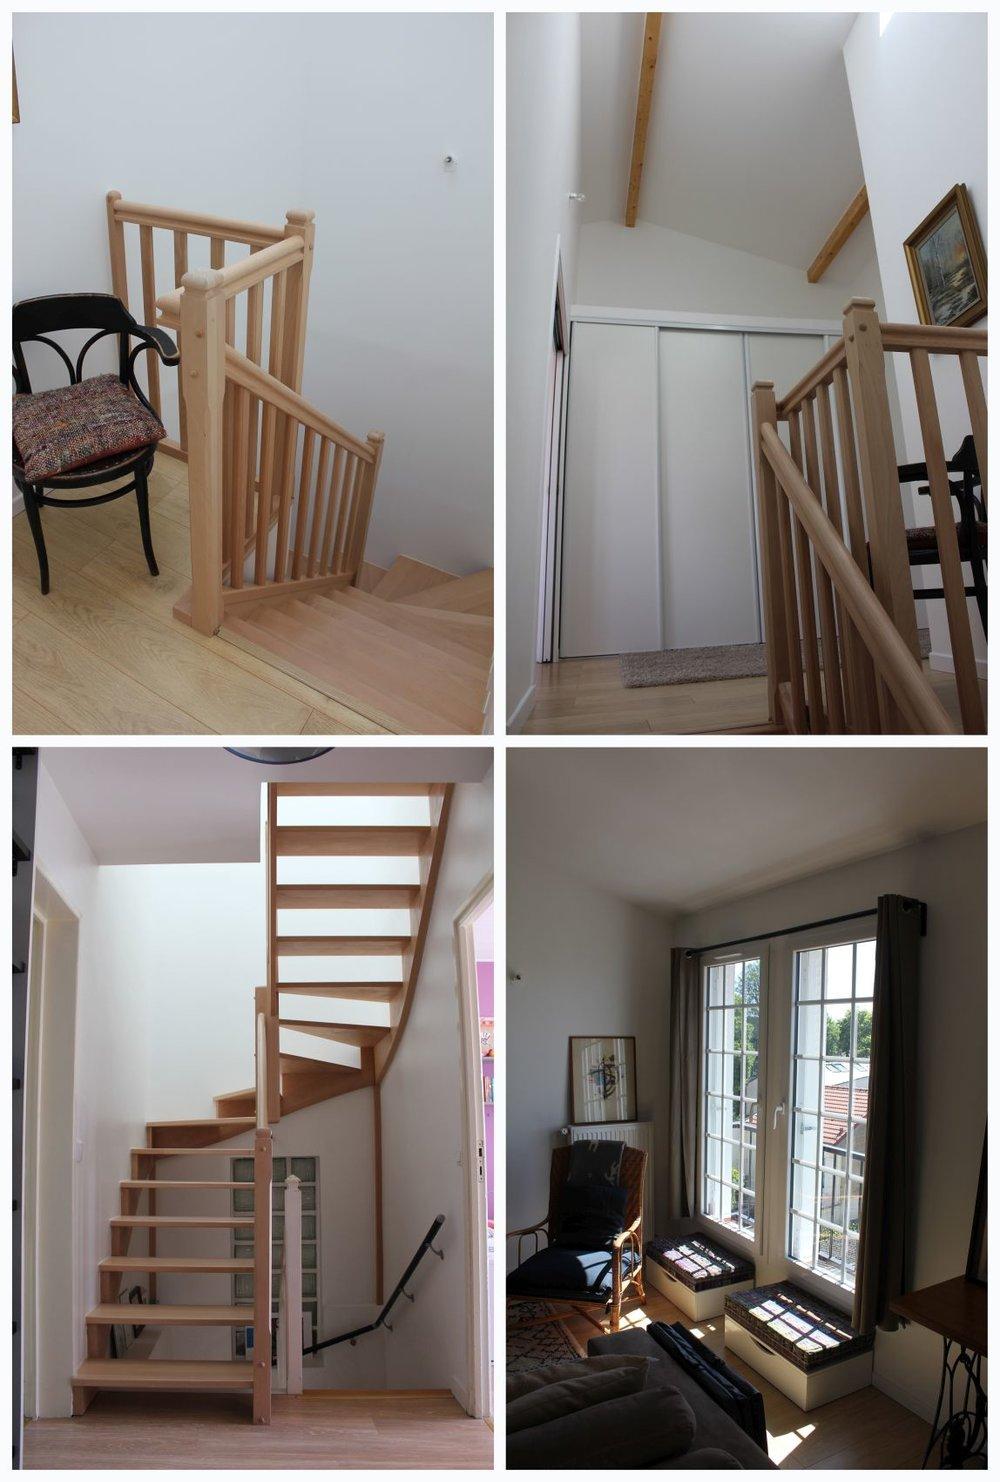 09_interieur escalier.JPG